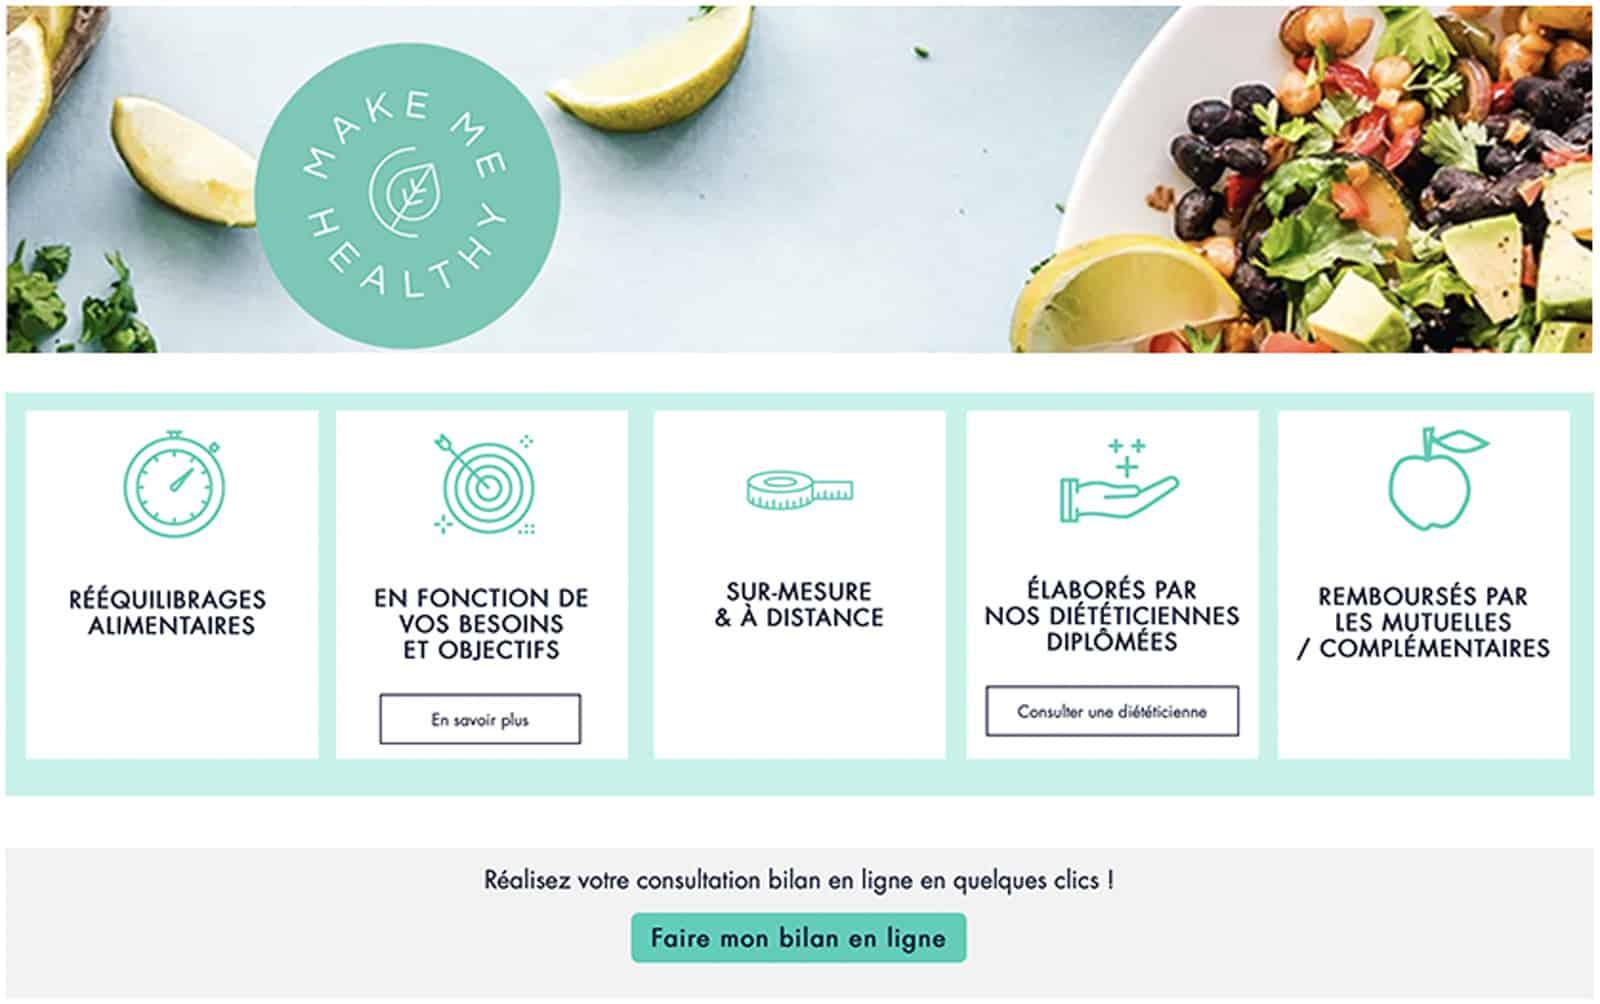 Services-Dietetique-EMGIDI-healthy